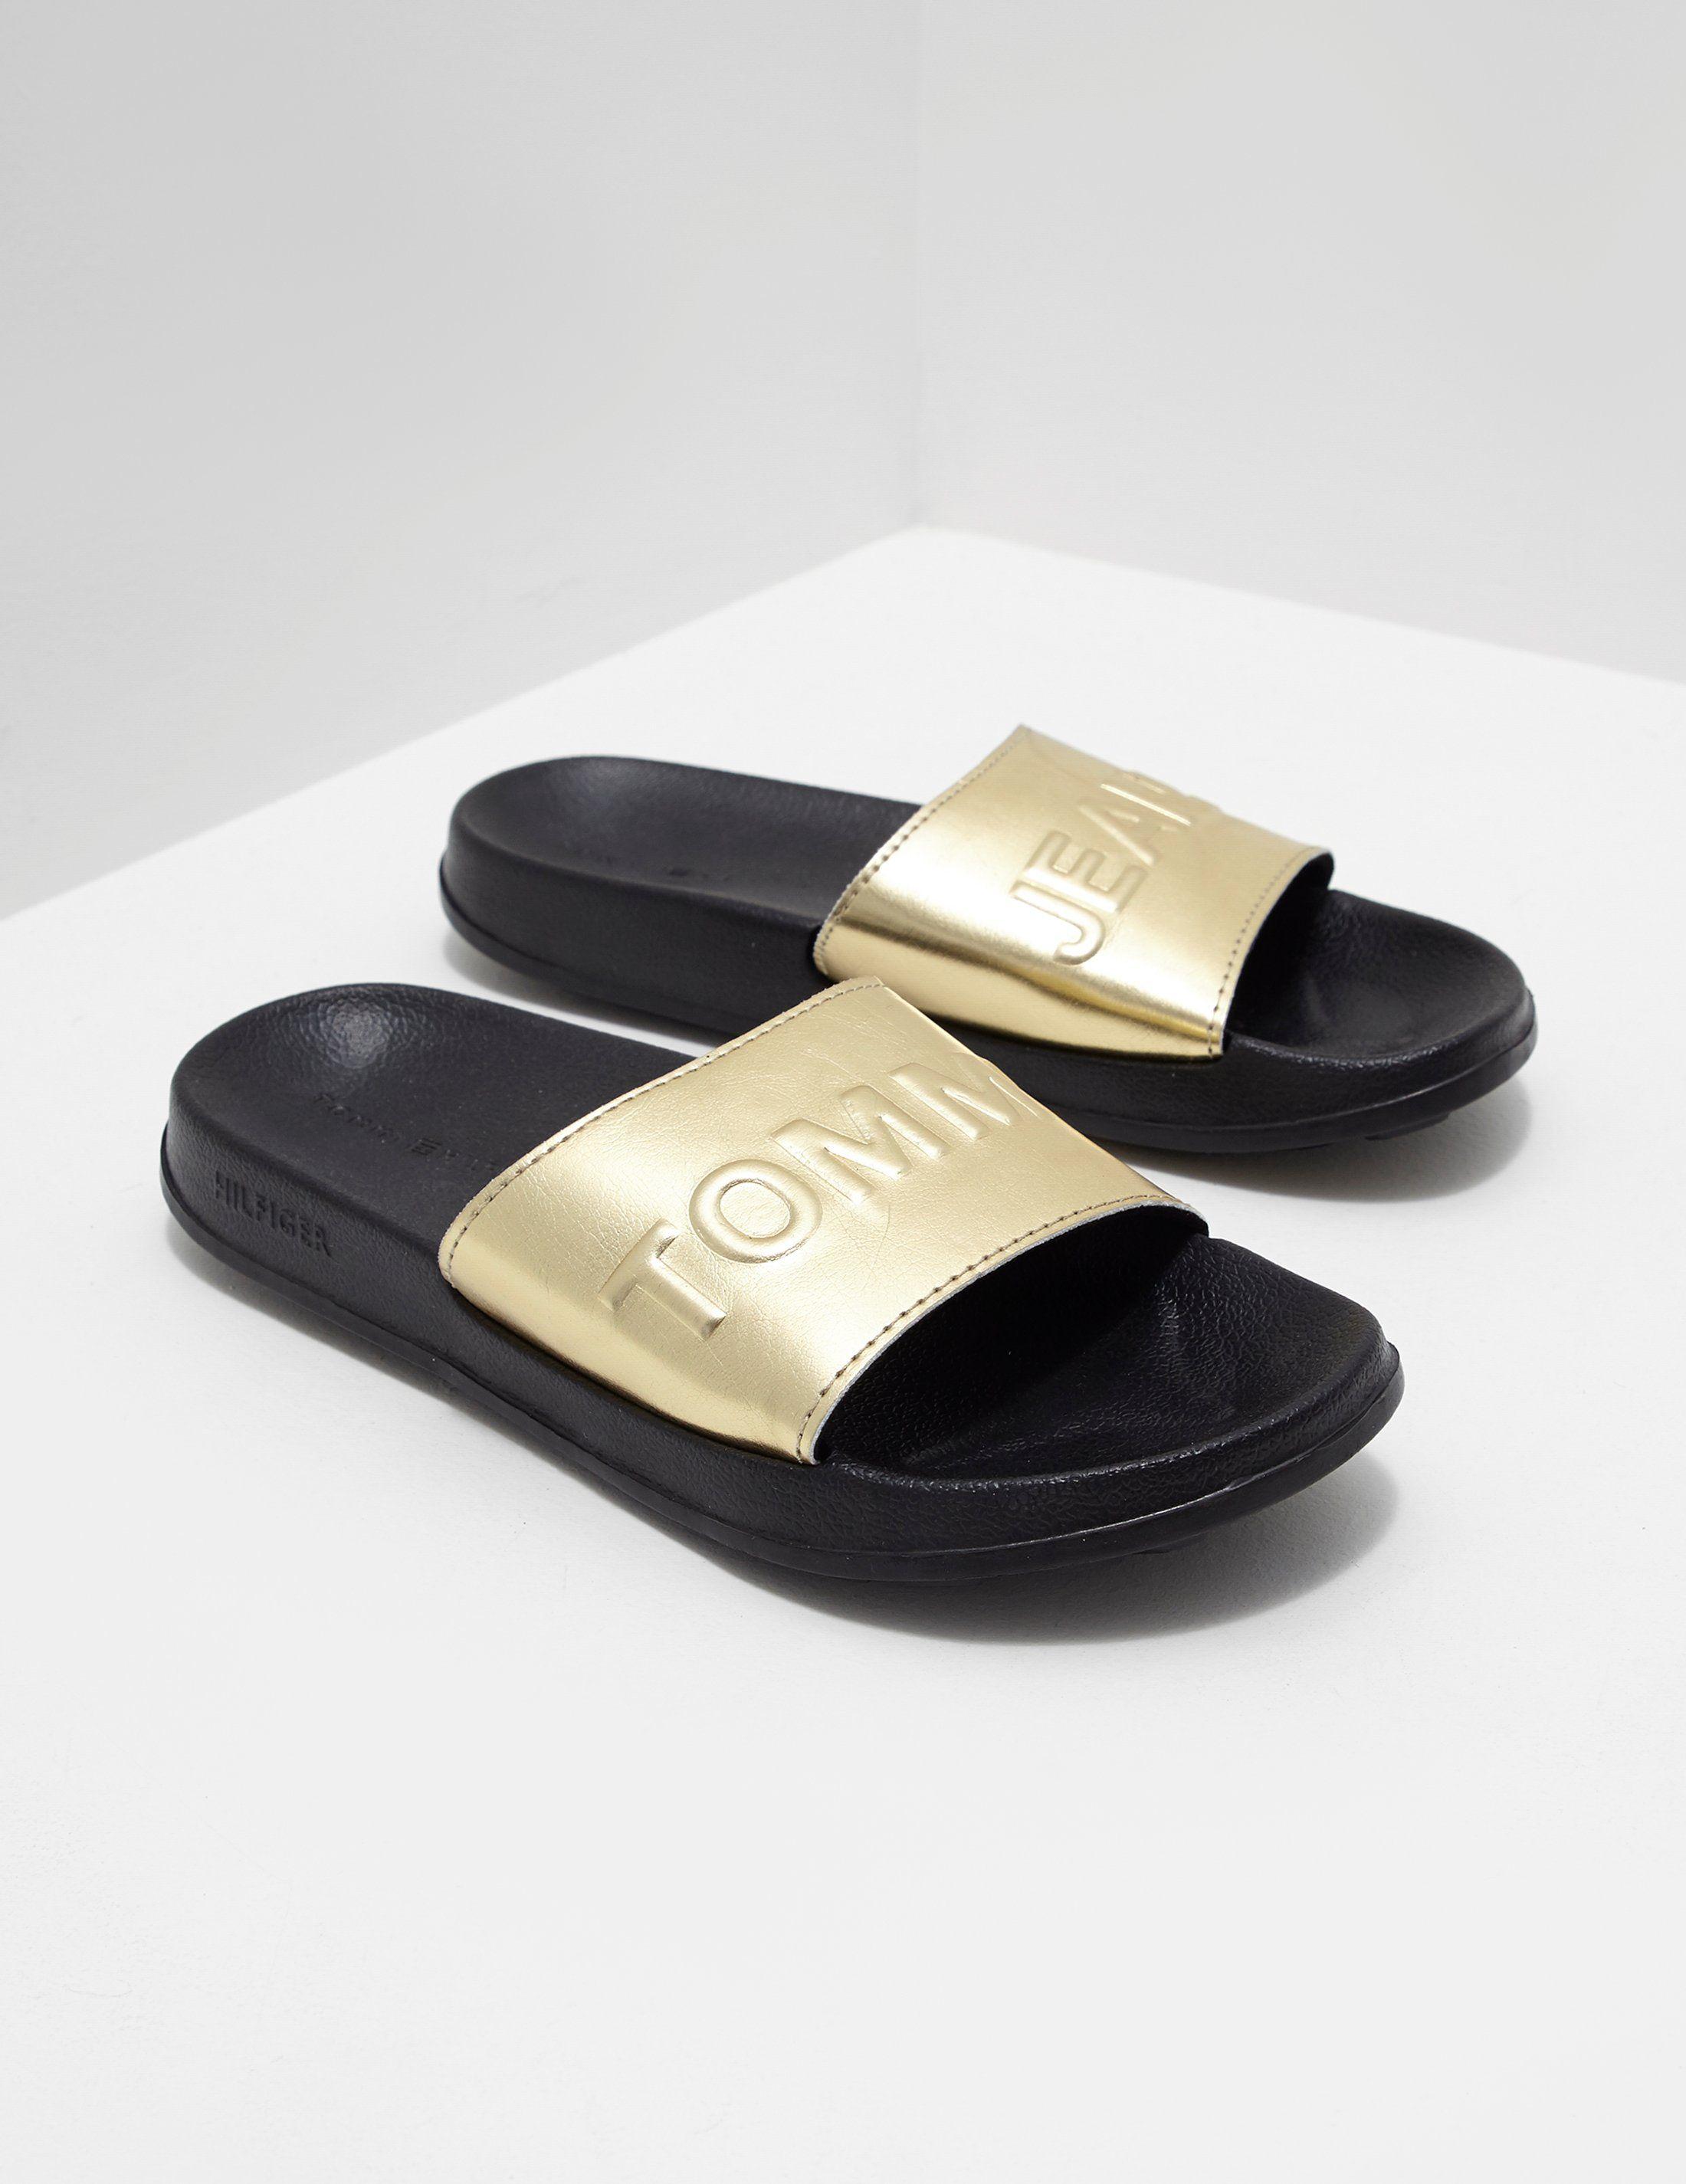 Tommy Jeans Metallic Pool Slides